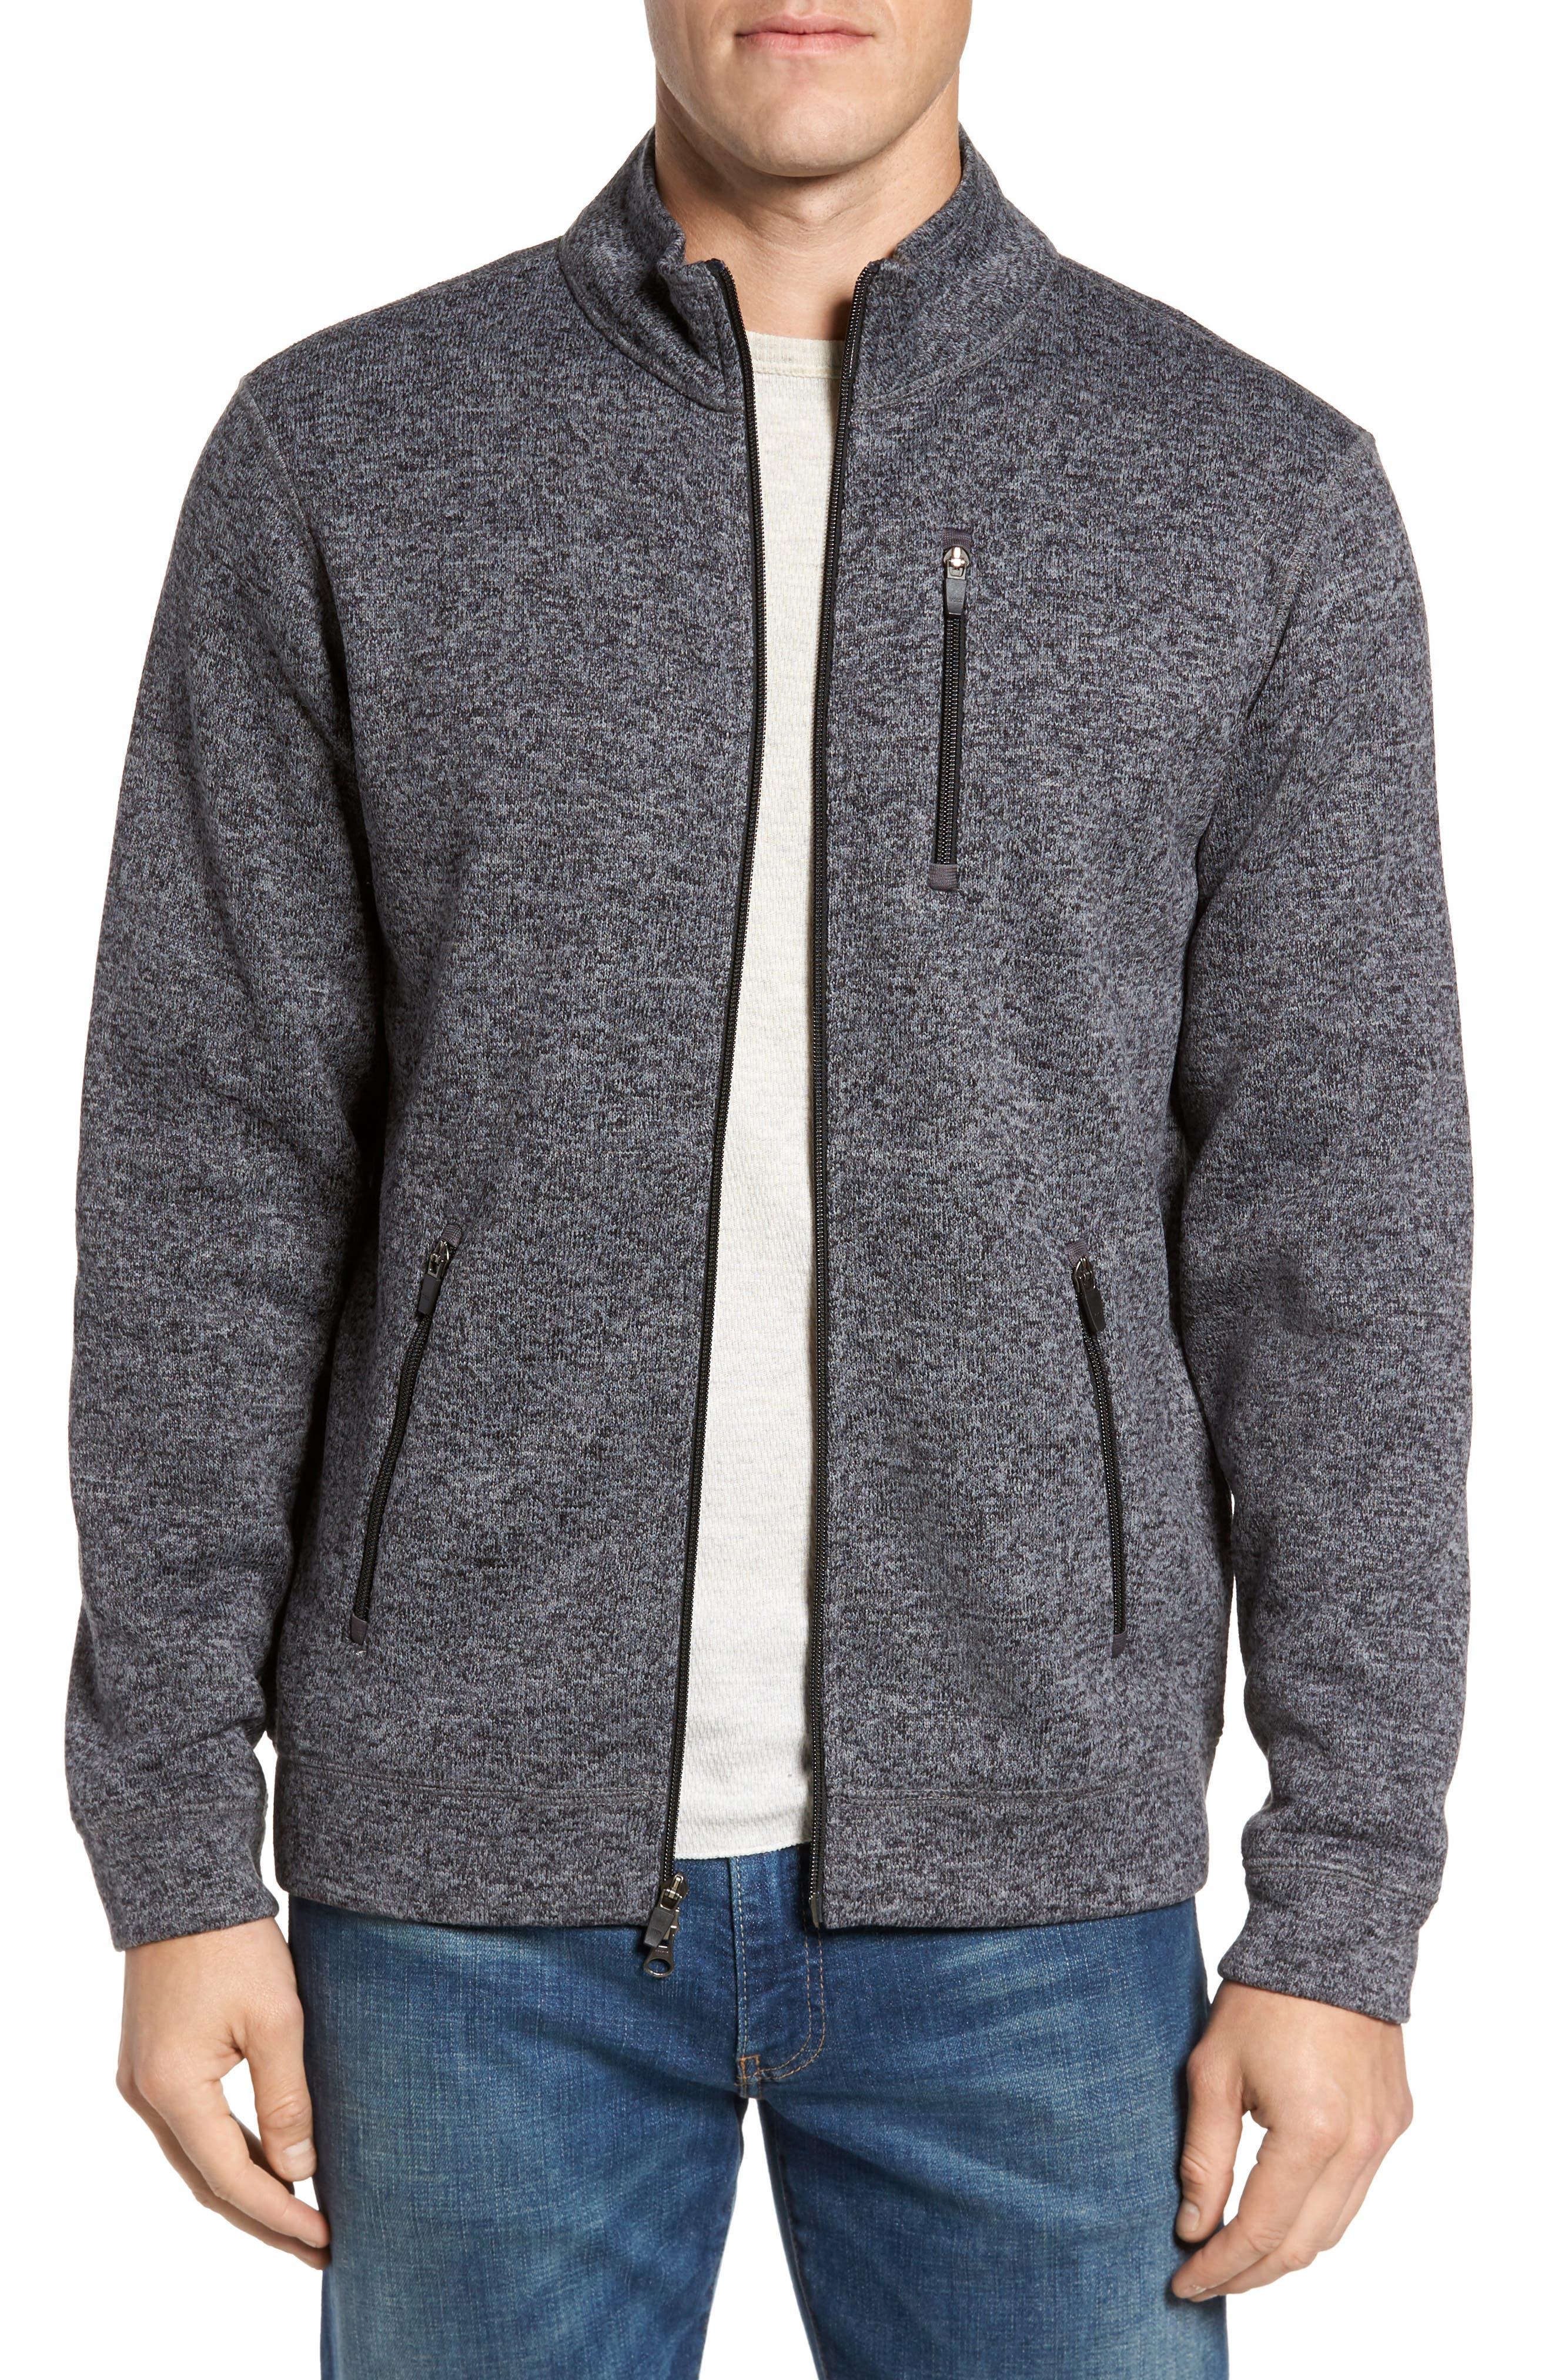 Sweater Knit Fleece Zip Front Jacket,                             Main thumbnail 1, color,                             Black/ Grey